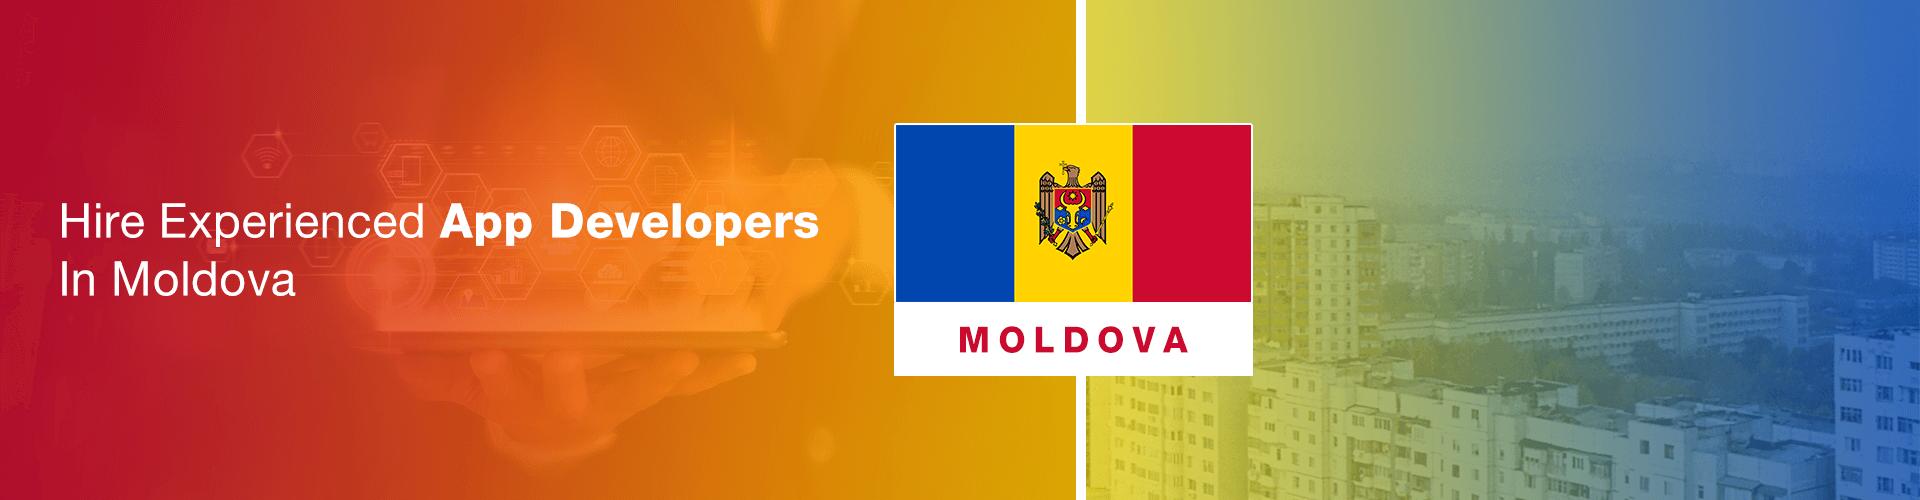 mobile app development moldova